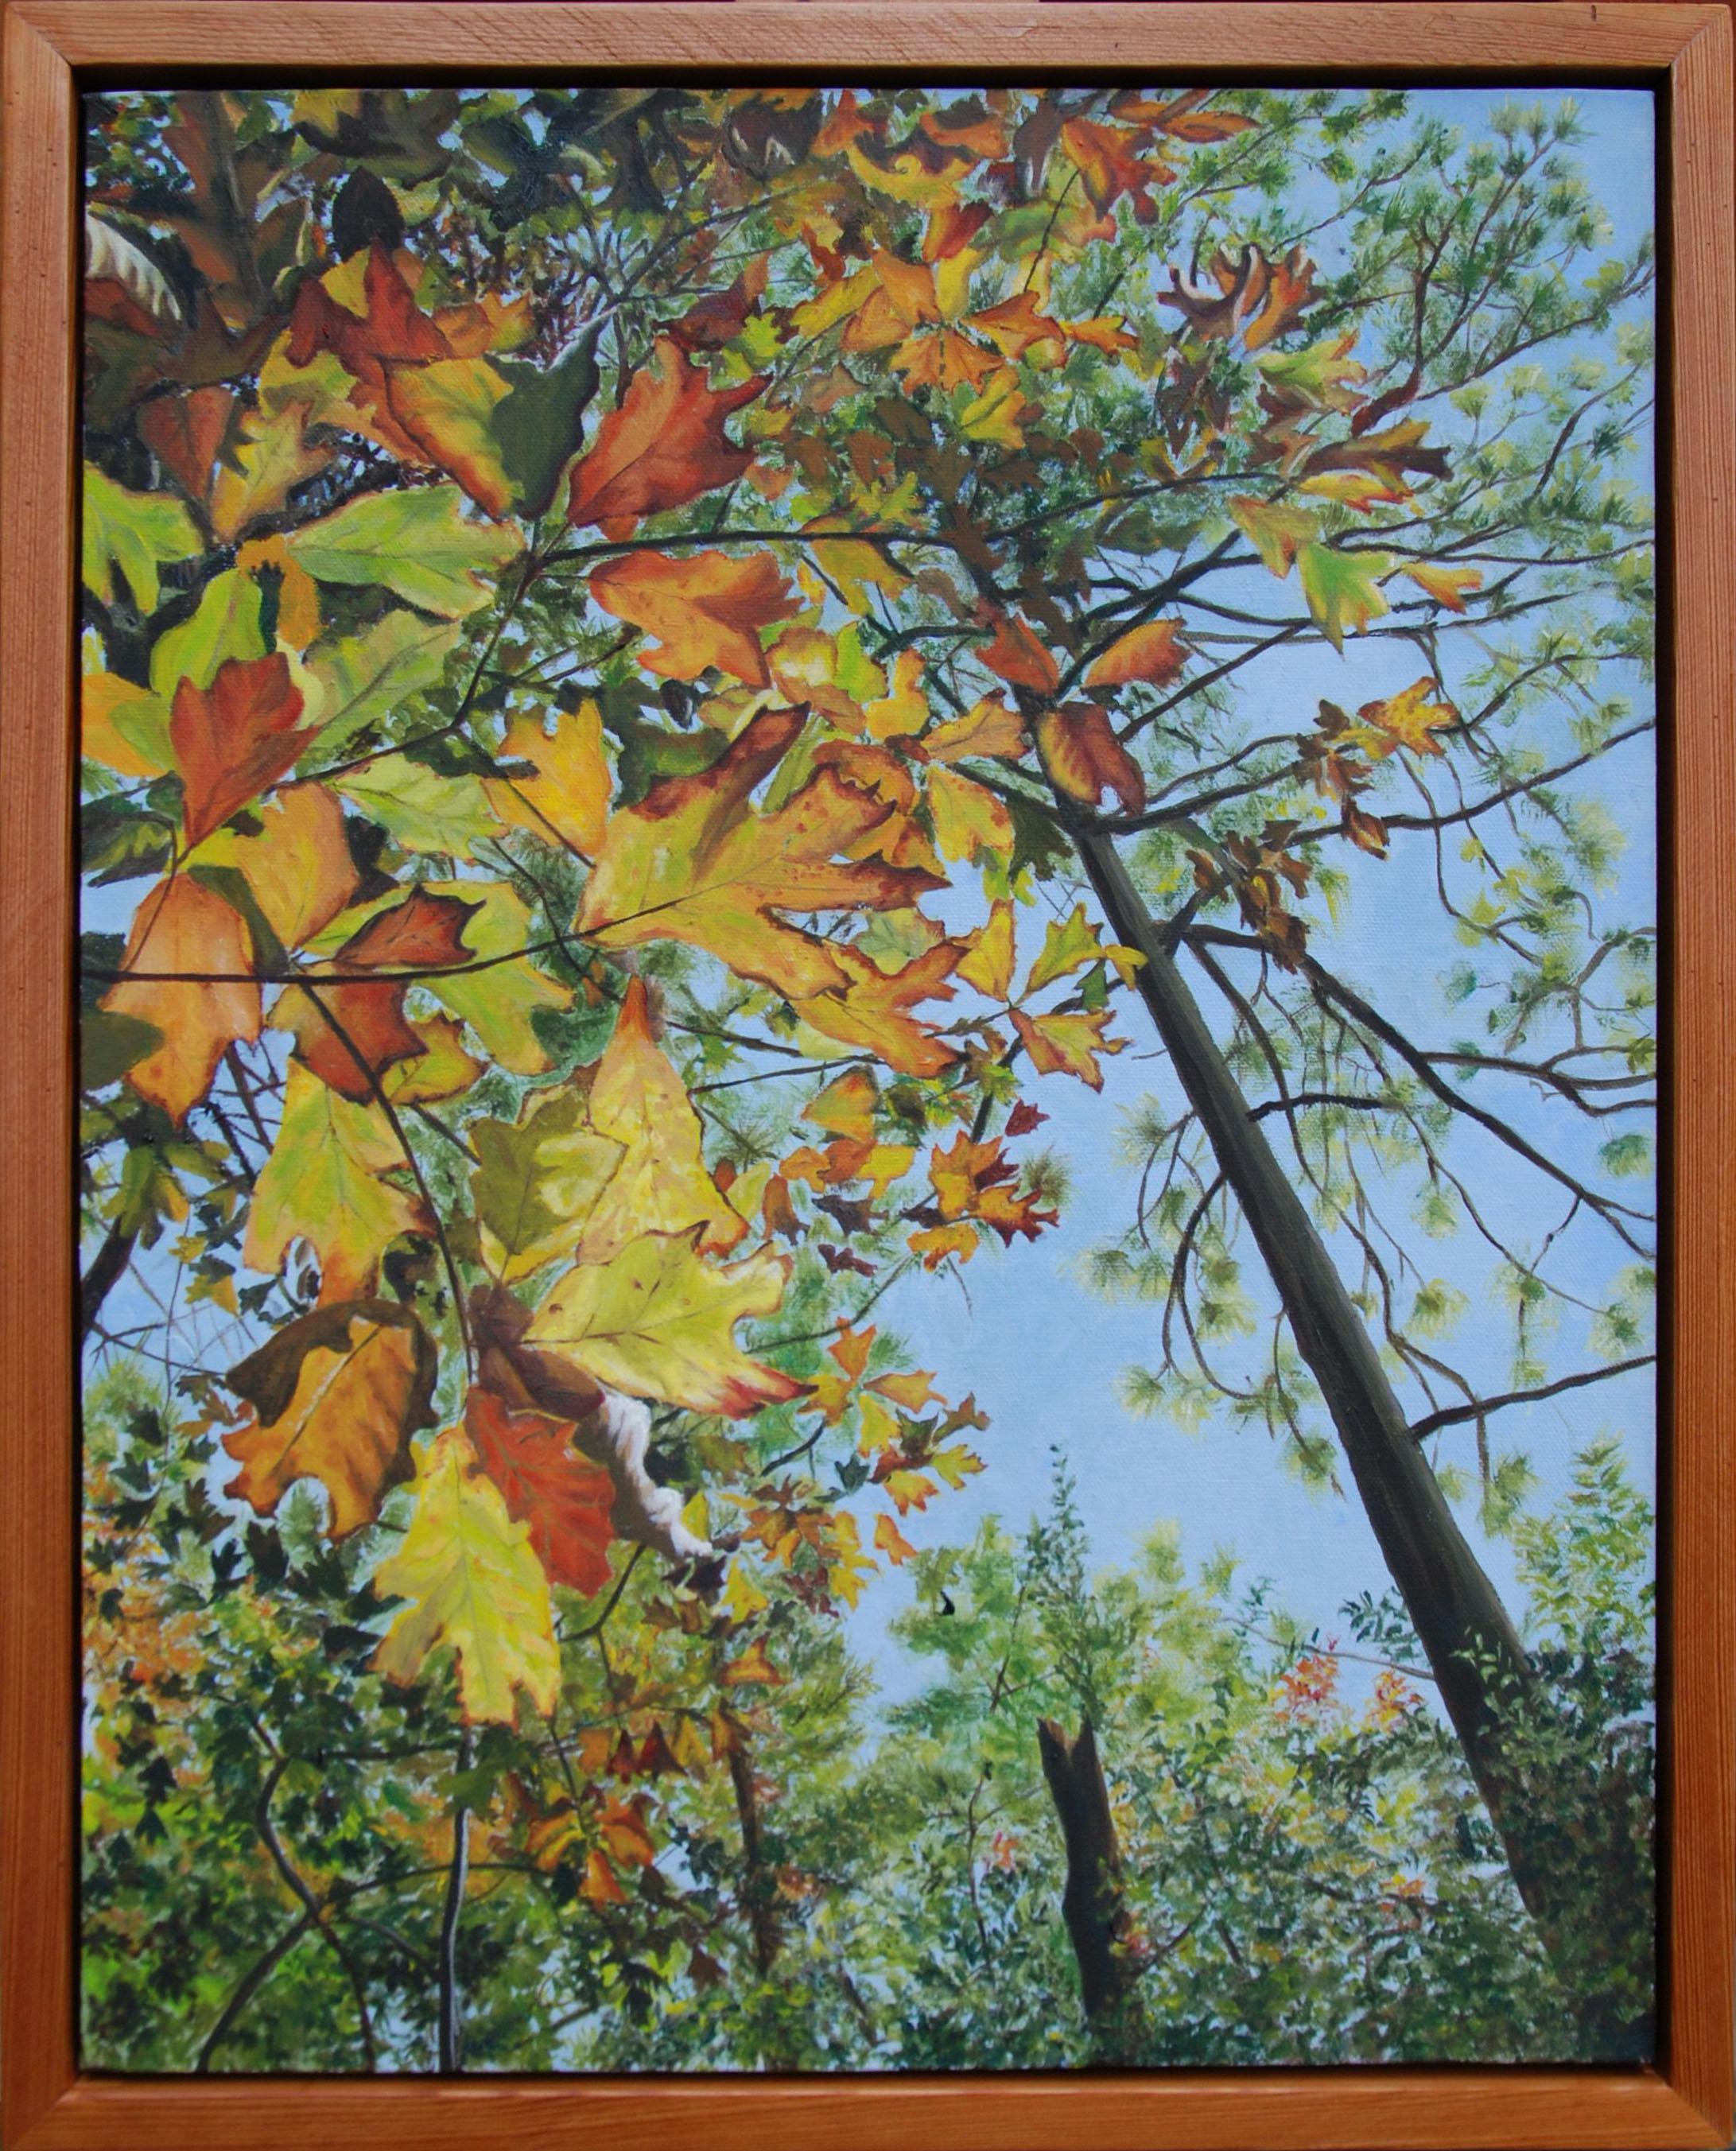 "An Autumn Walk Through San Felasco Hammock #5 of 6; Stained glass window  oil on canvas, 22 x 18""; 2010;  $400.00"